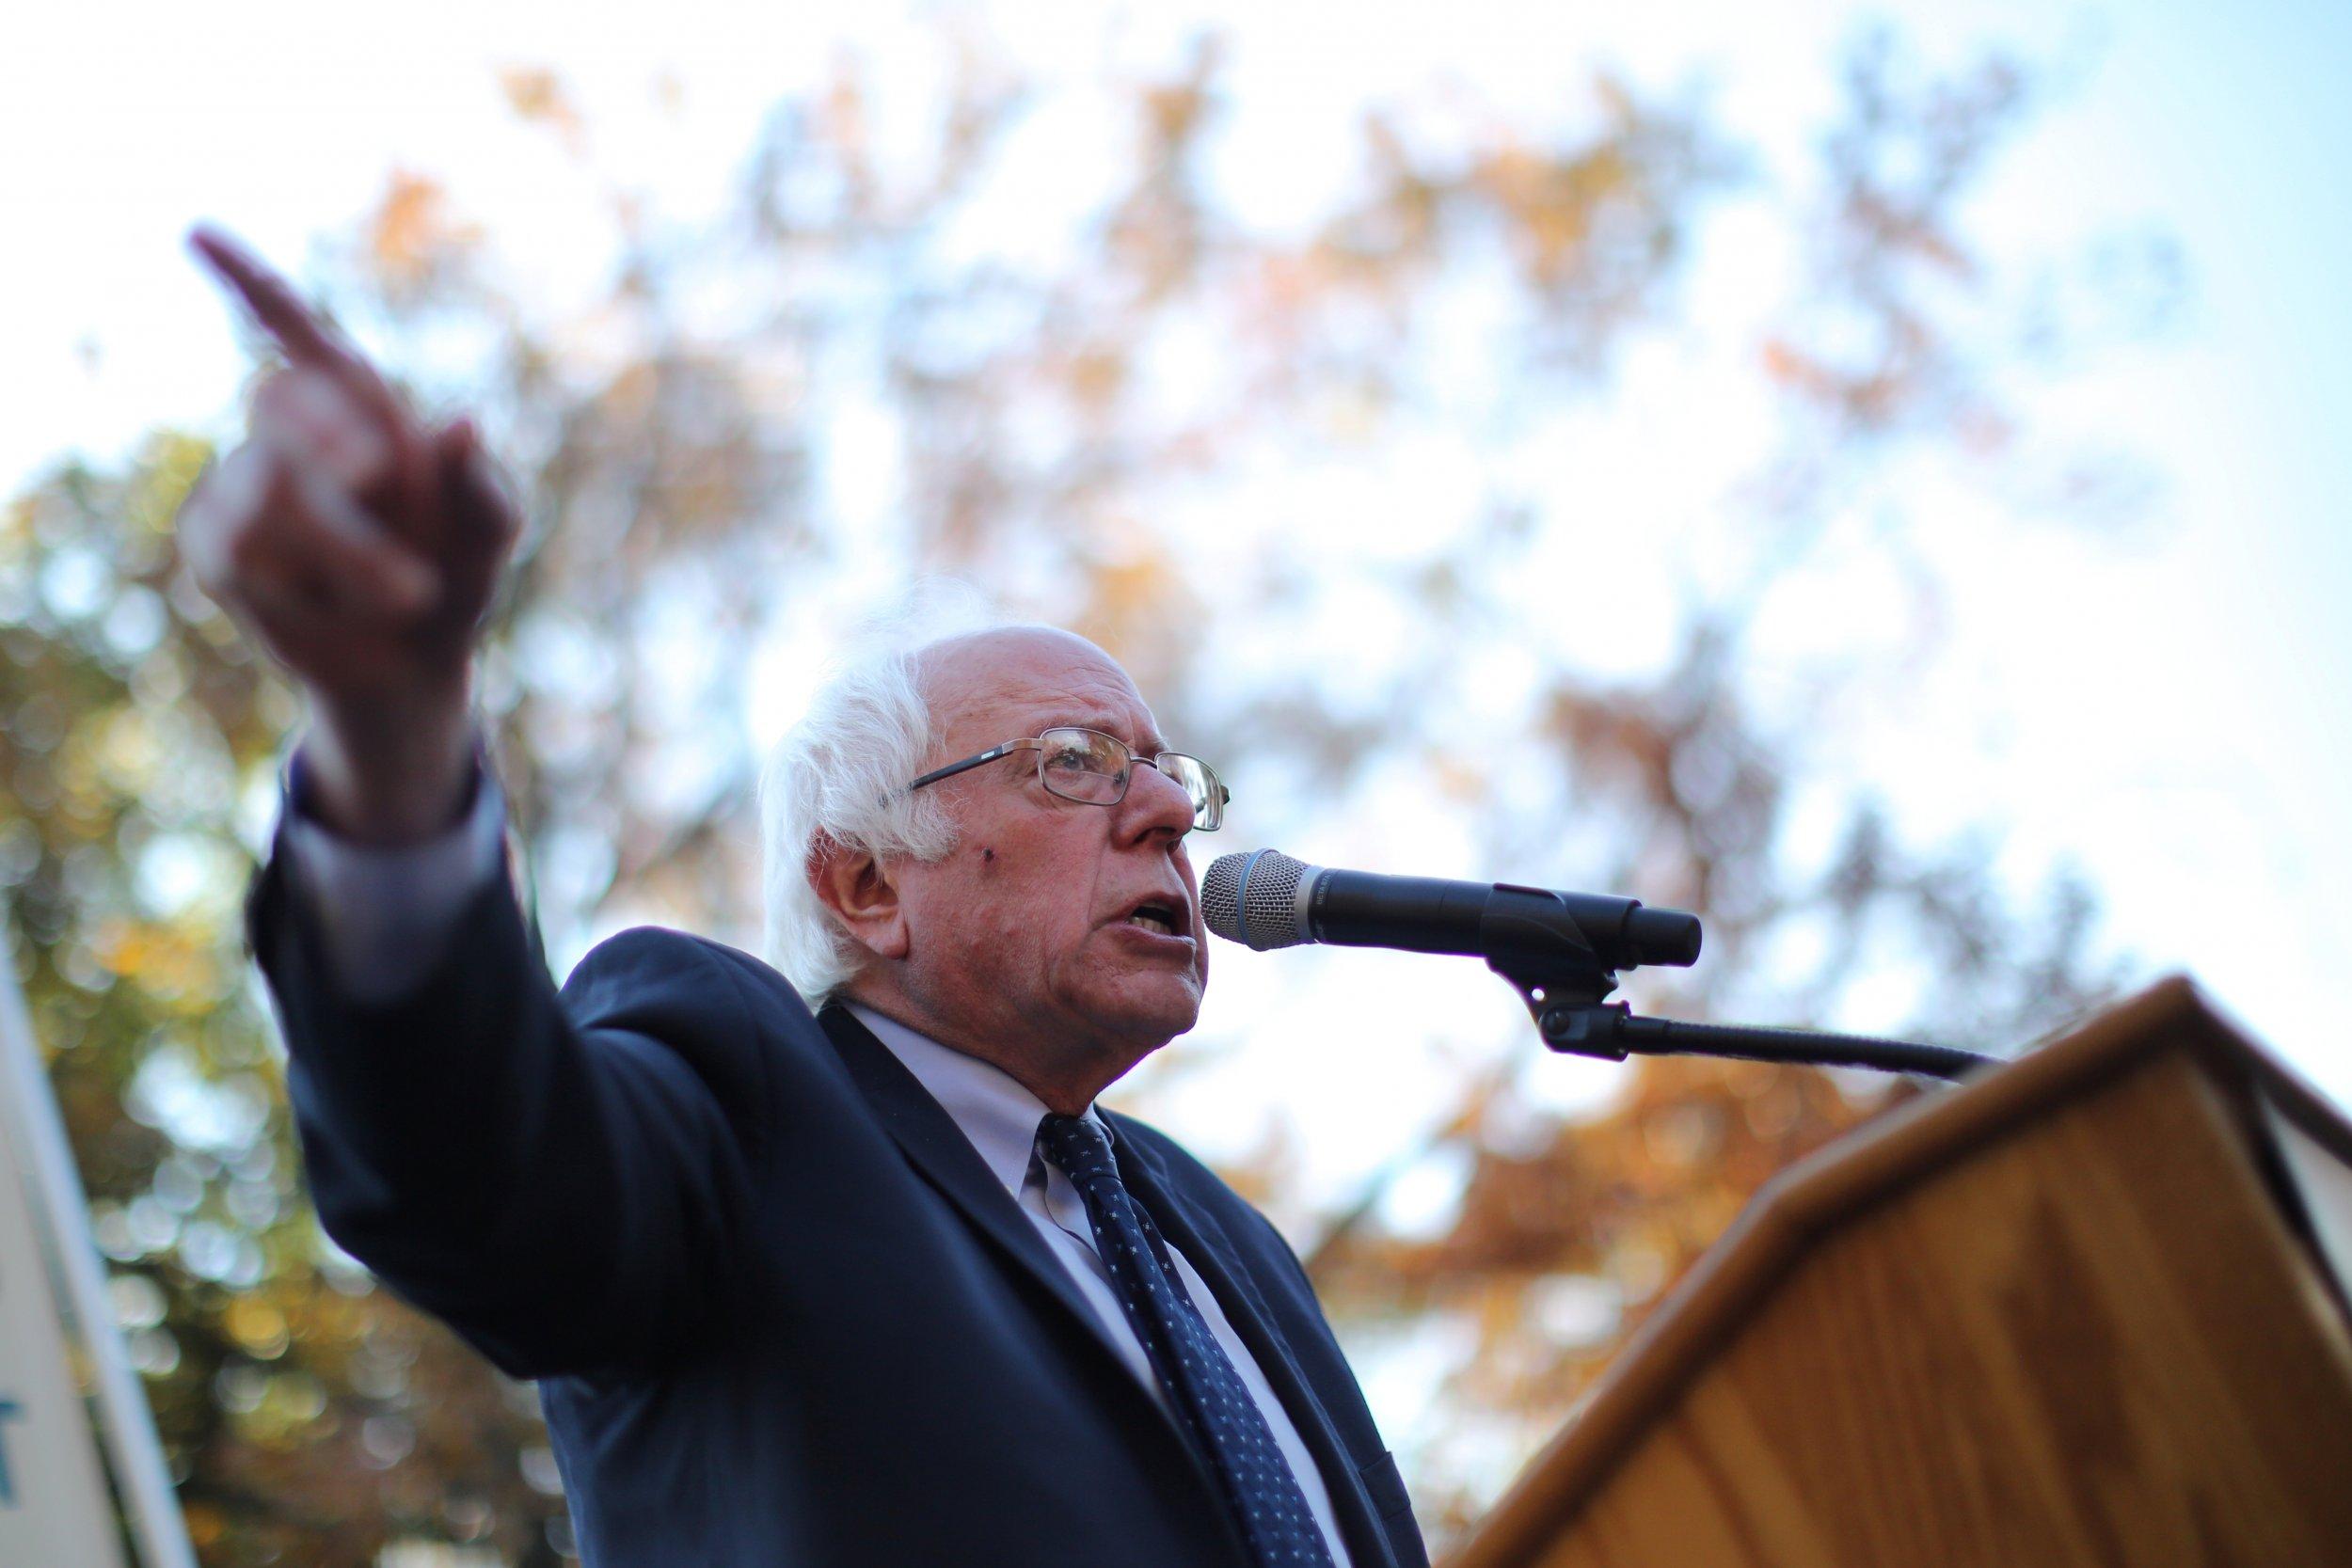 0104_Bernie_Sanders_CNN_01